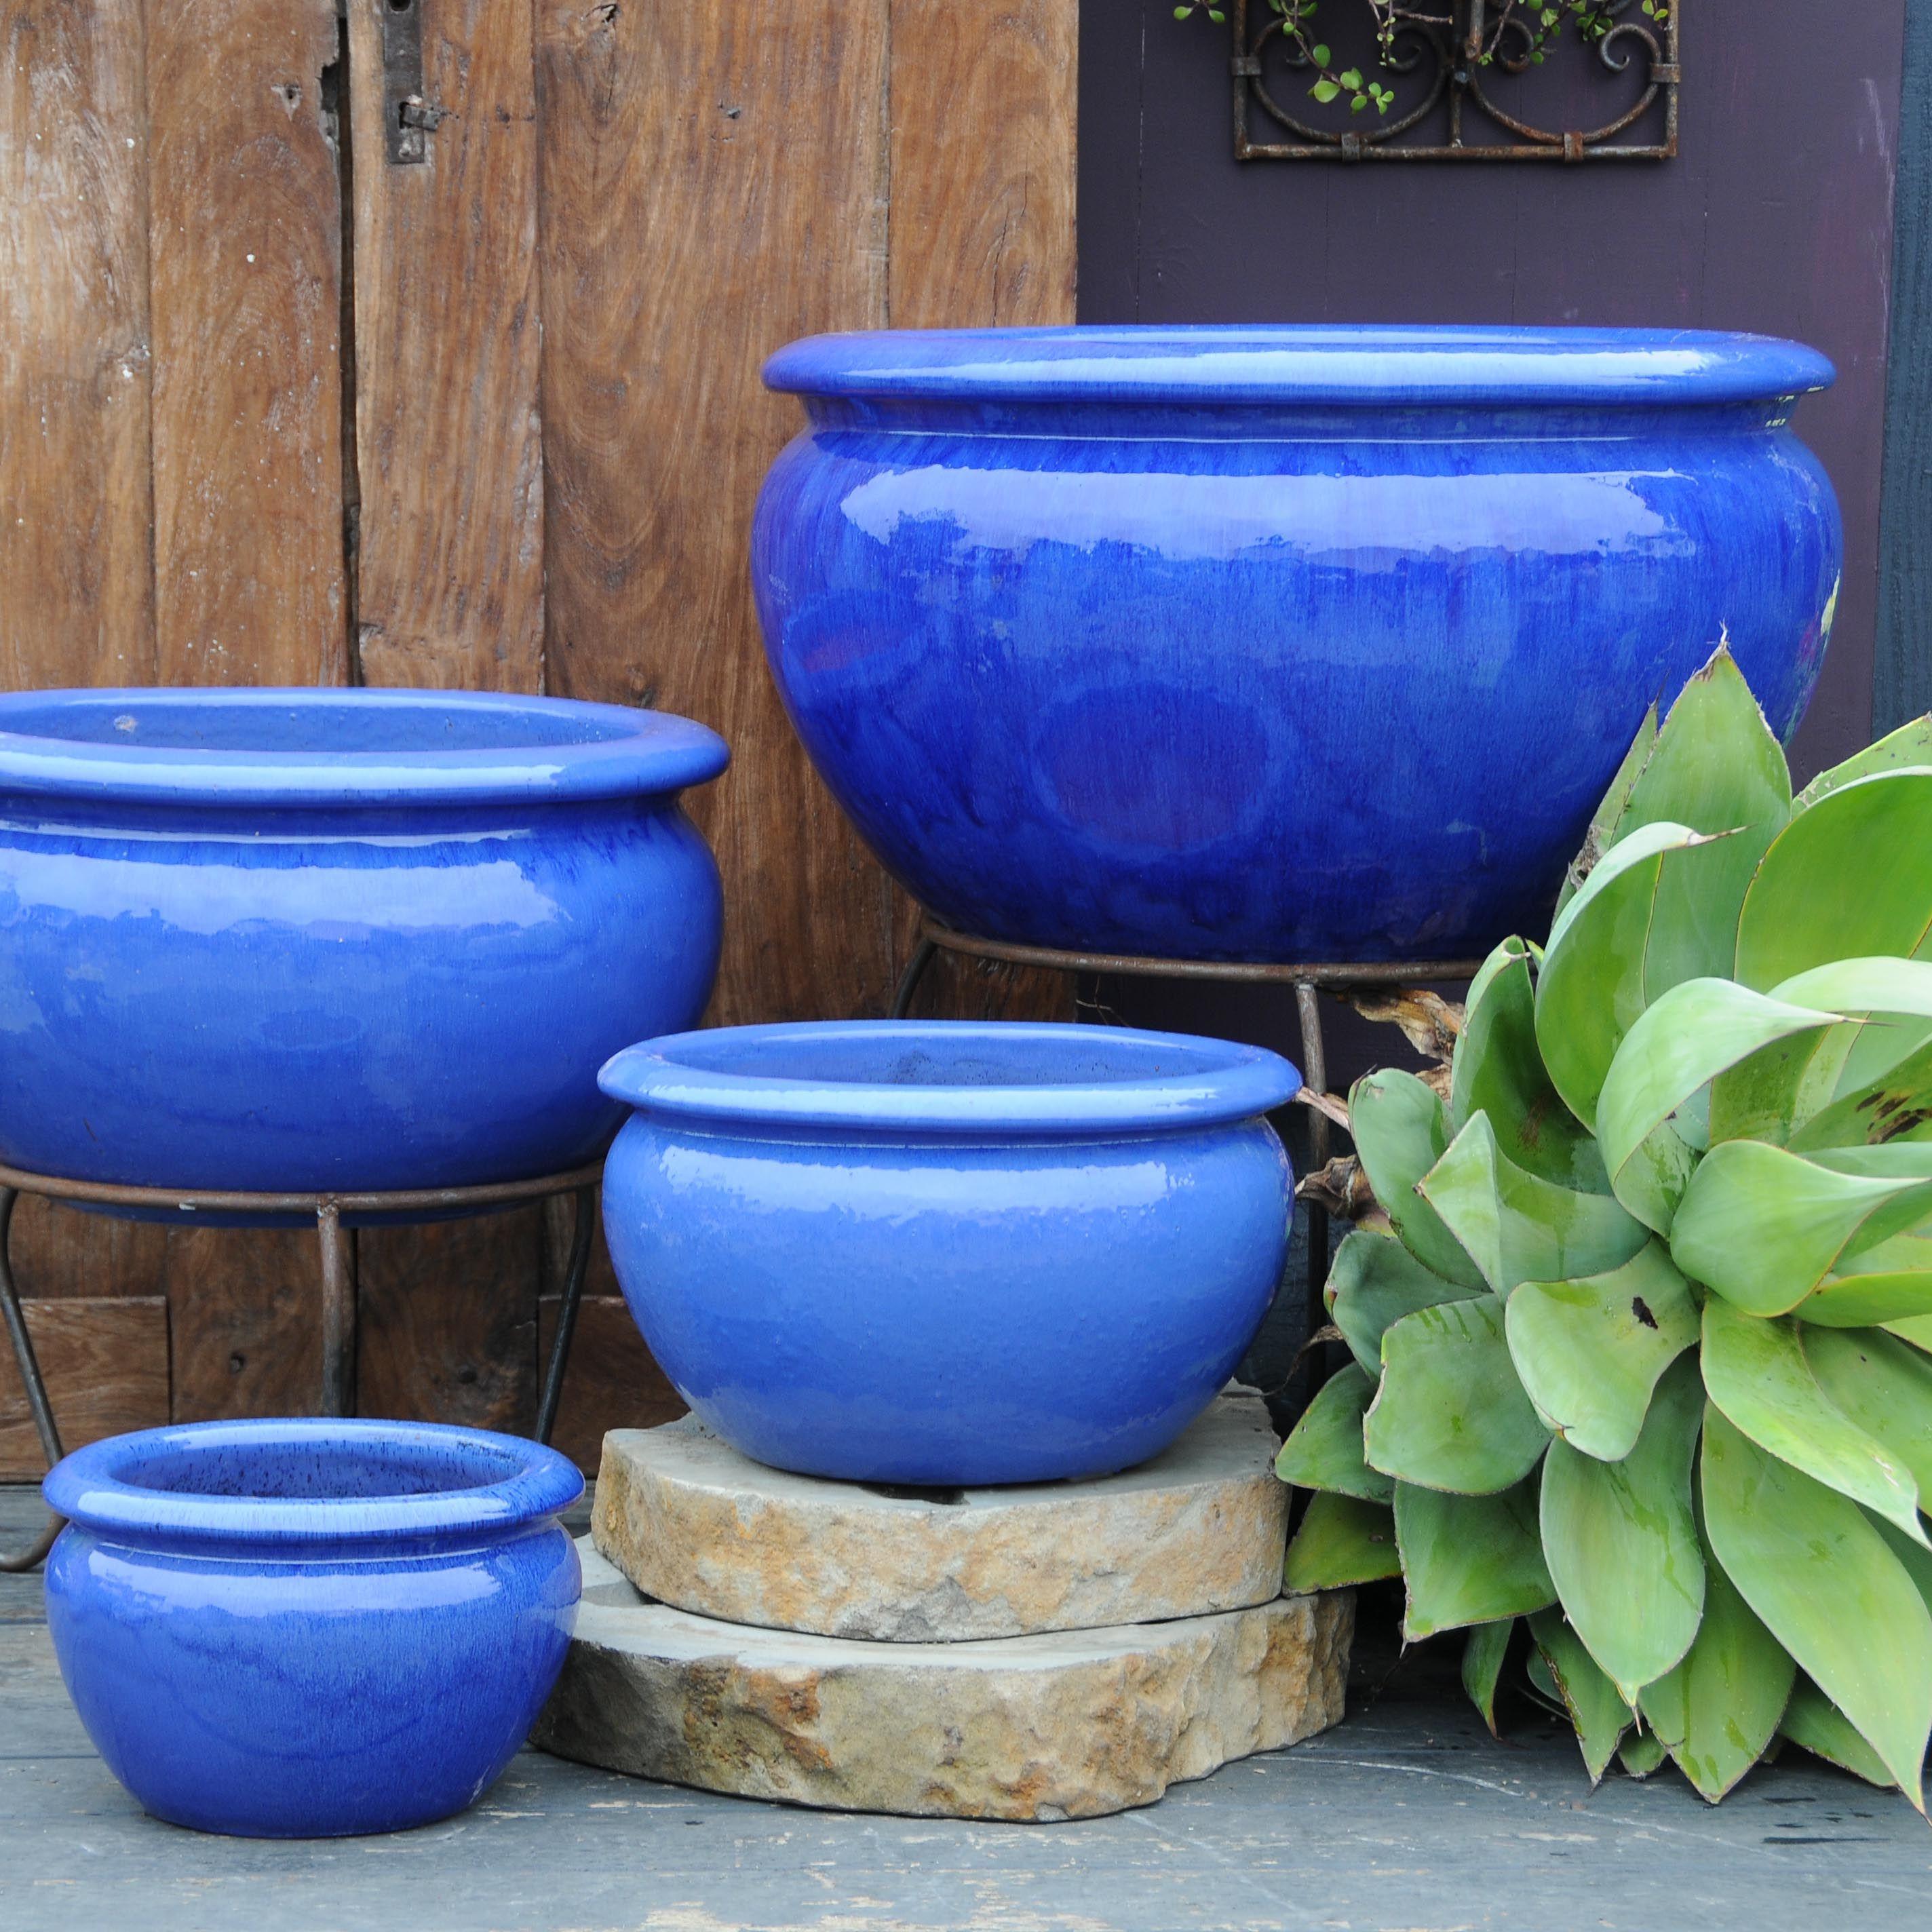 Garden Center Dennis 7 Dees Garden Pottery Plant 400 x 300